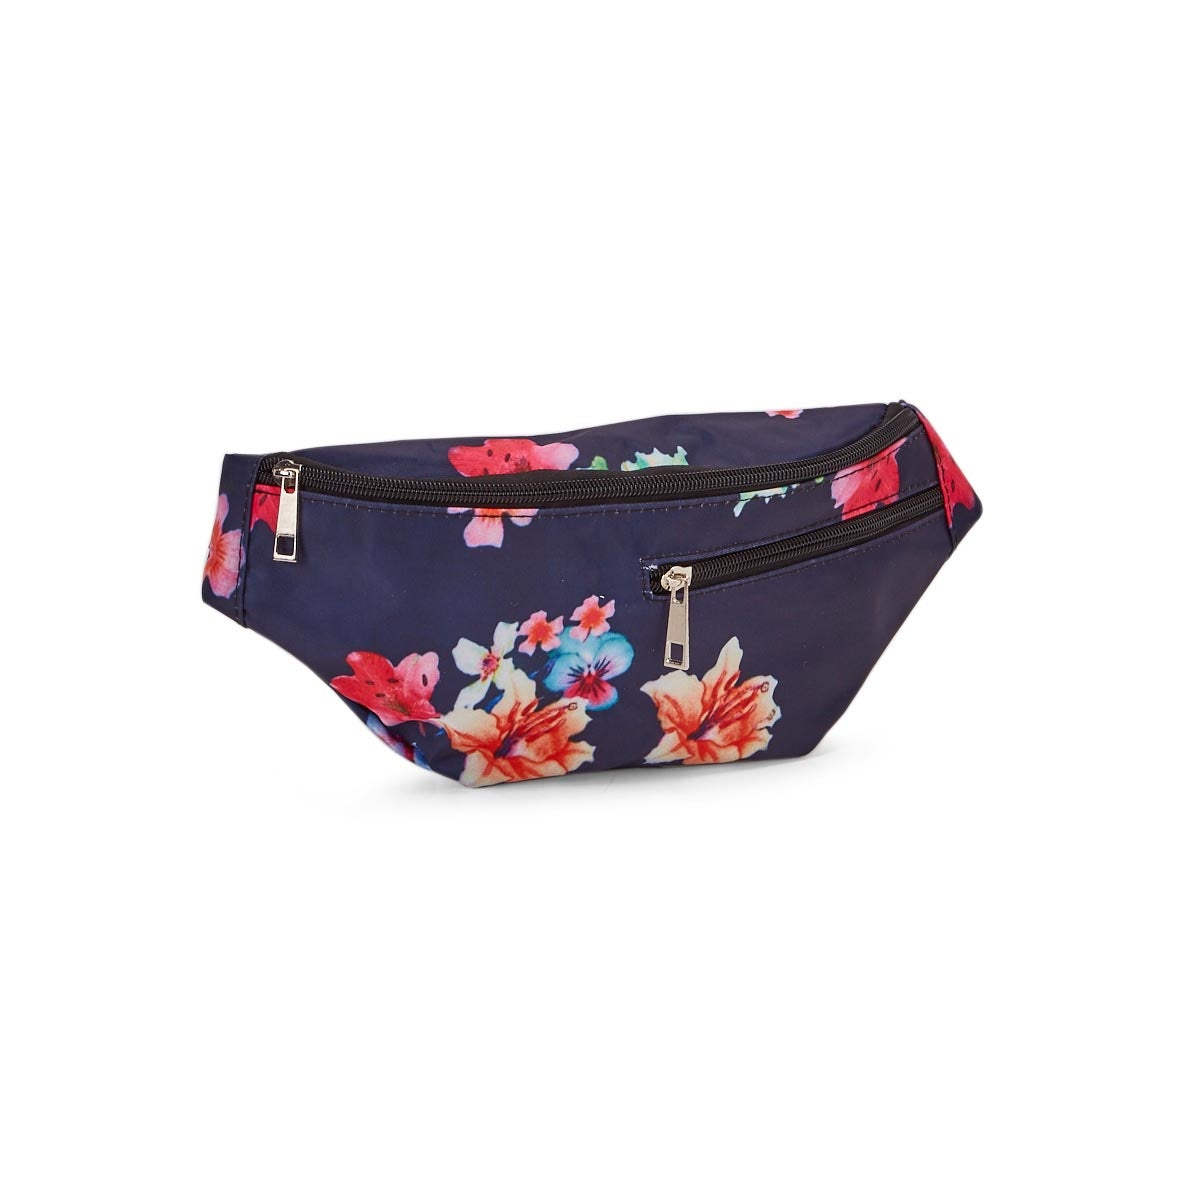 Lds navy/multi fanny pack